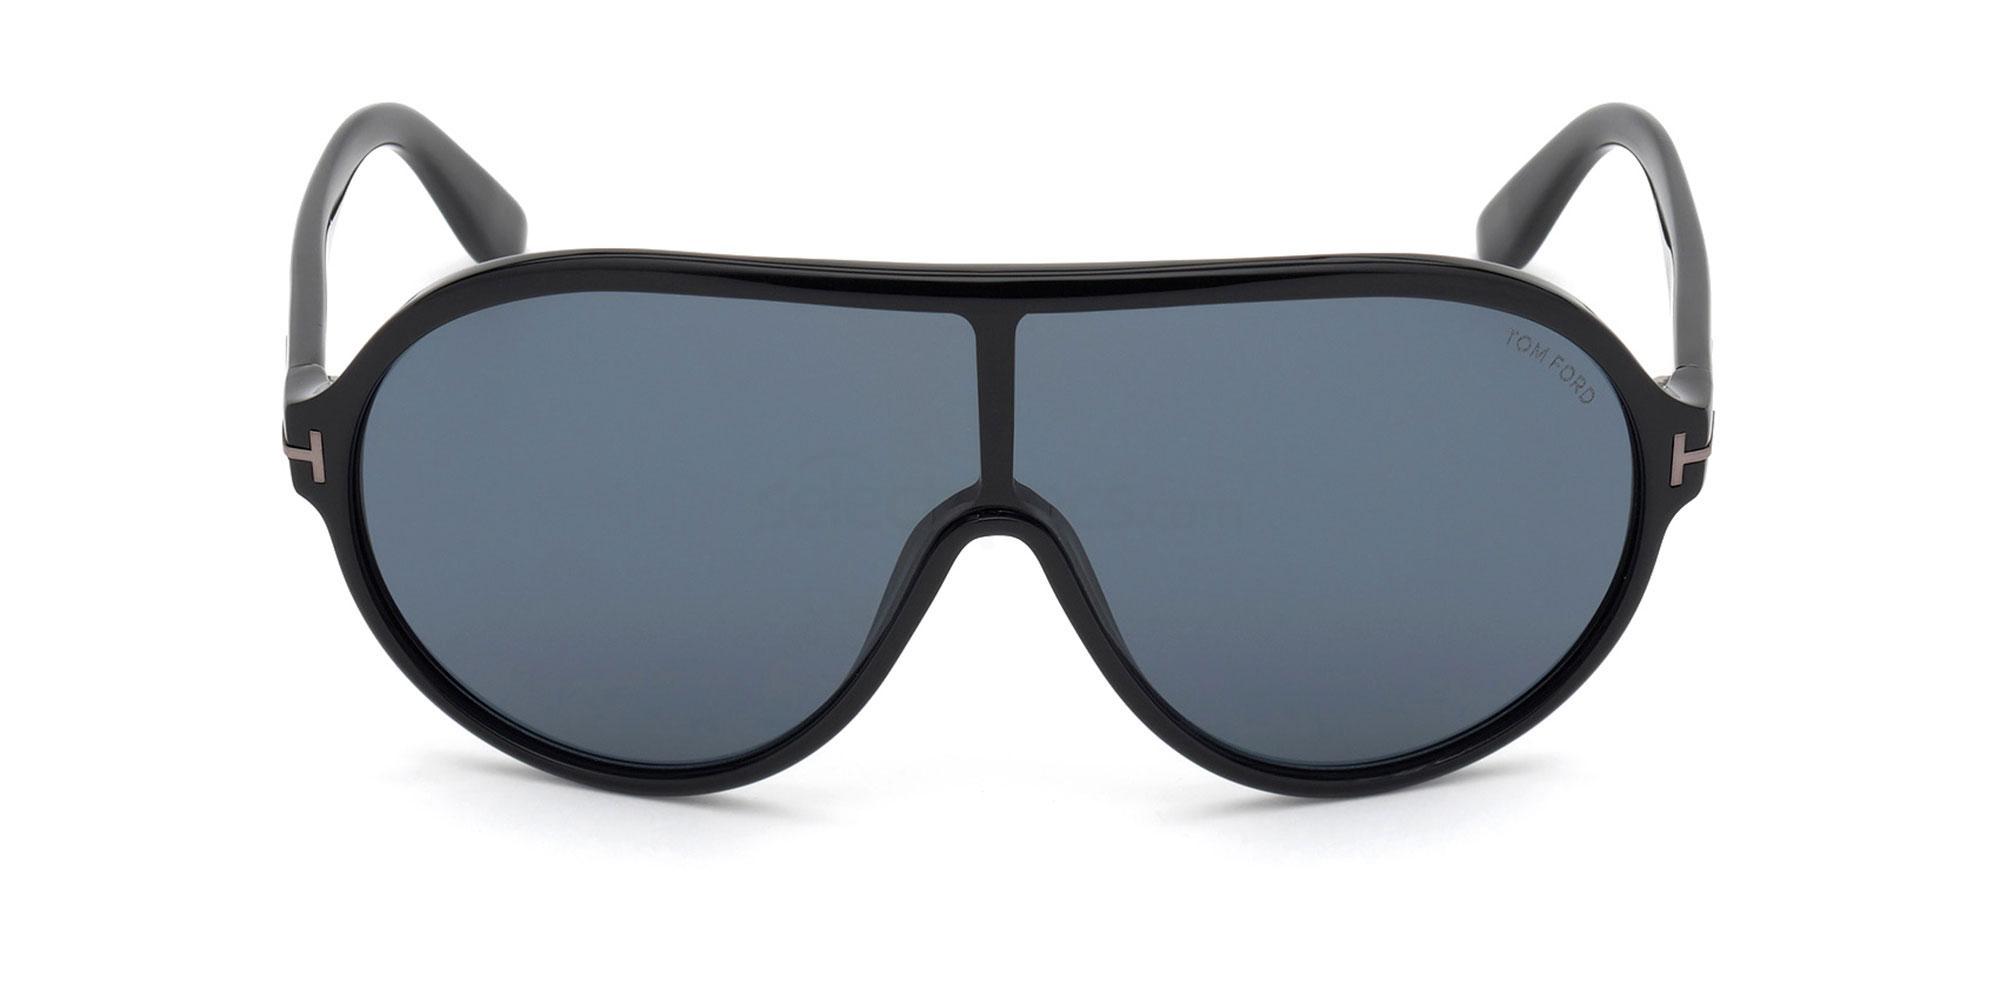 01A FT0814-N Sunglasses, Tom Ford